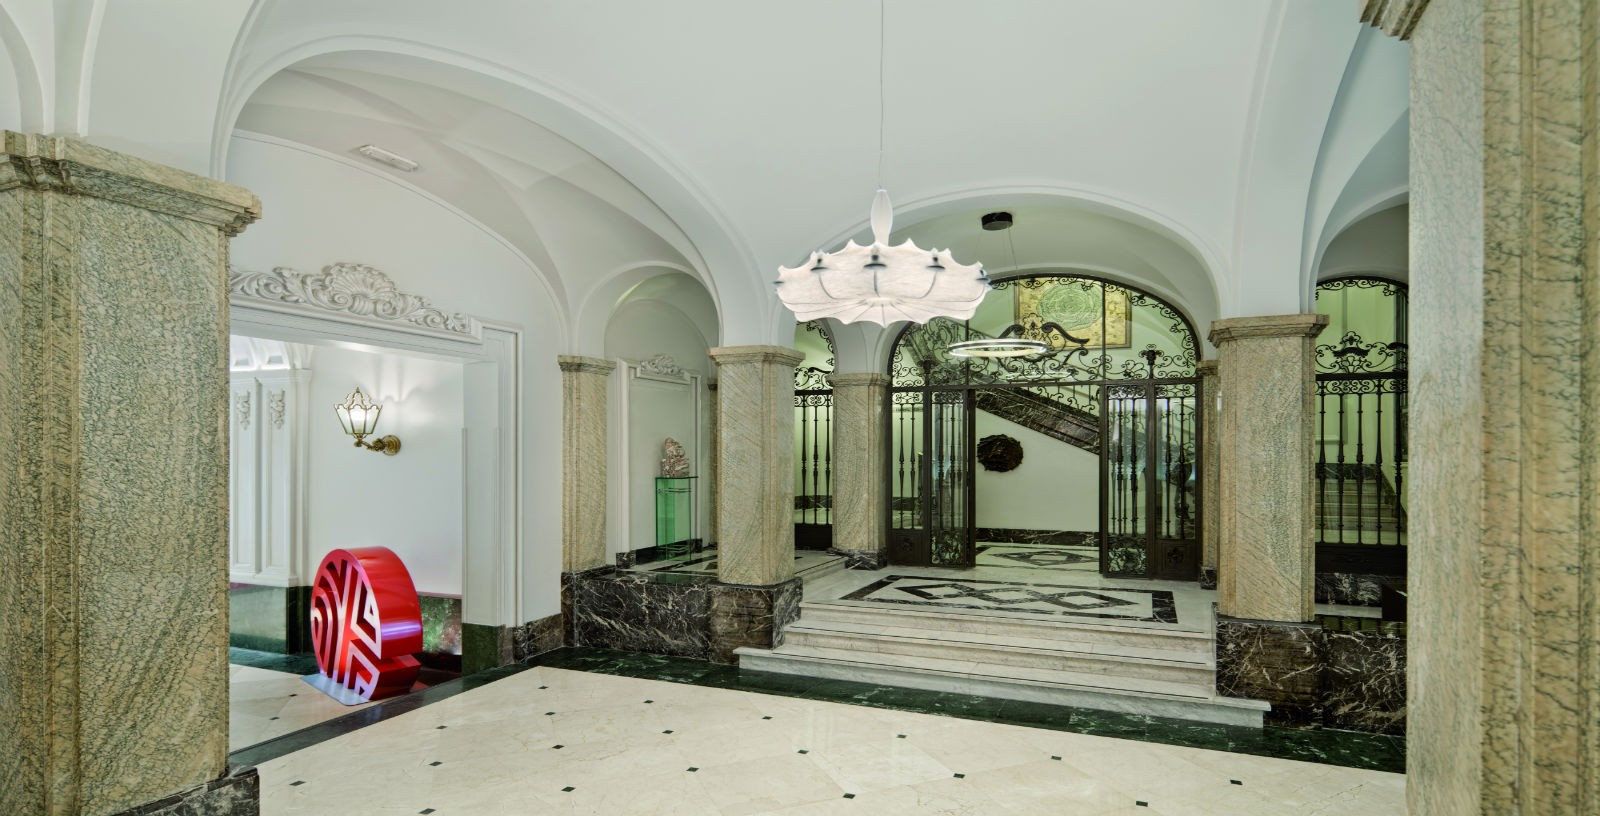 NH_ABASCAL_HOTEL_03_Architecture_IDOM_Copyright